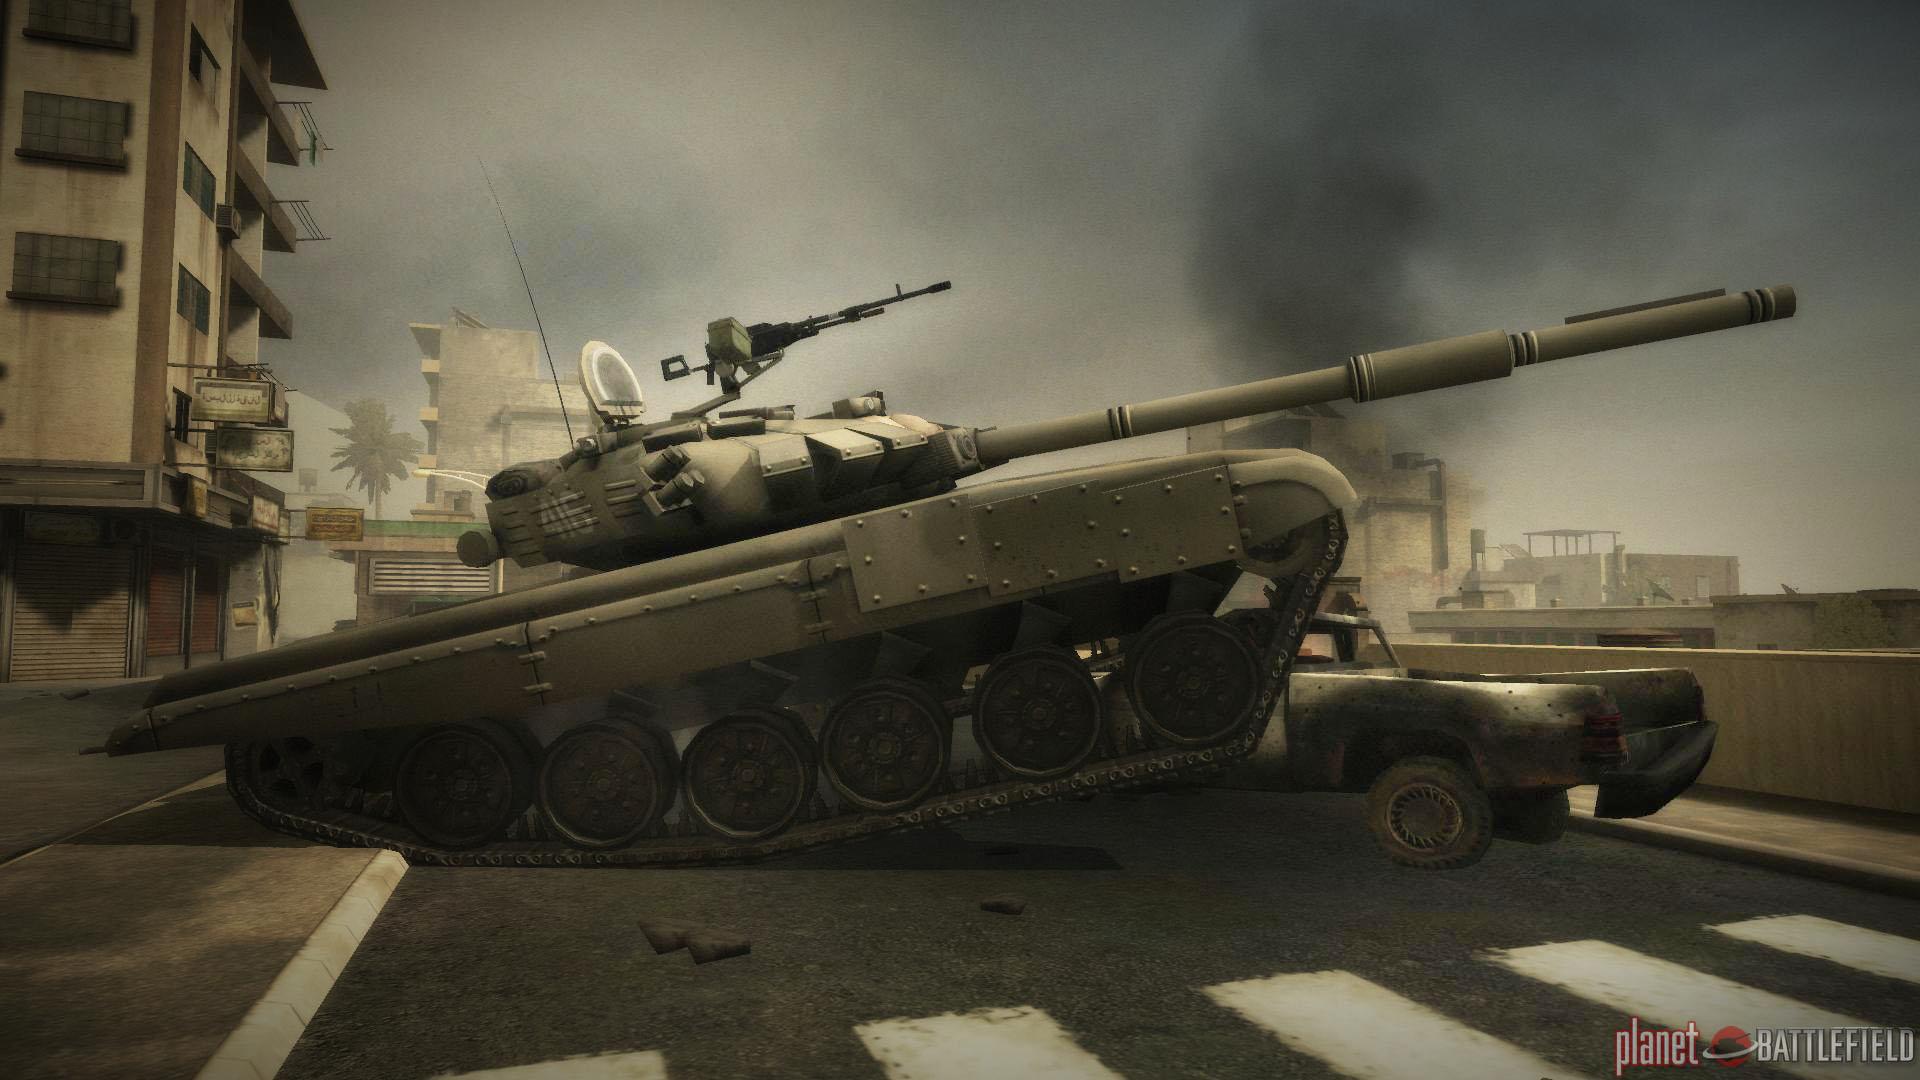 http://pnmedia.gamespy.com/planetbattlefield.gamespy.com/images/news3/Battlefield-Play4Free_008.jpg